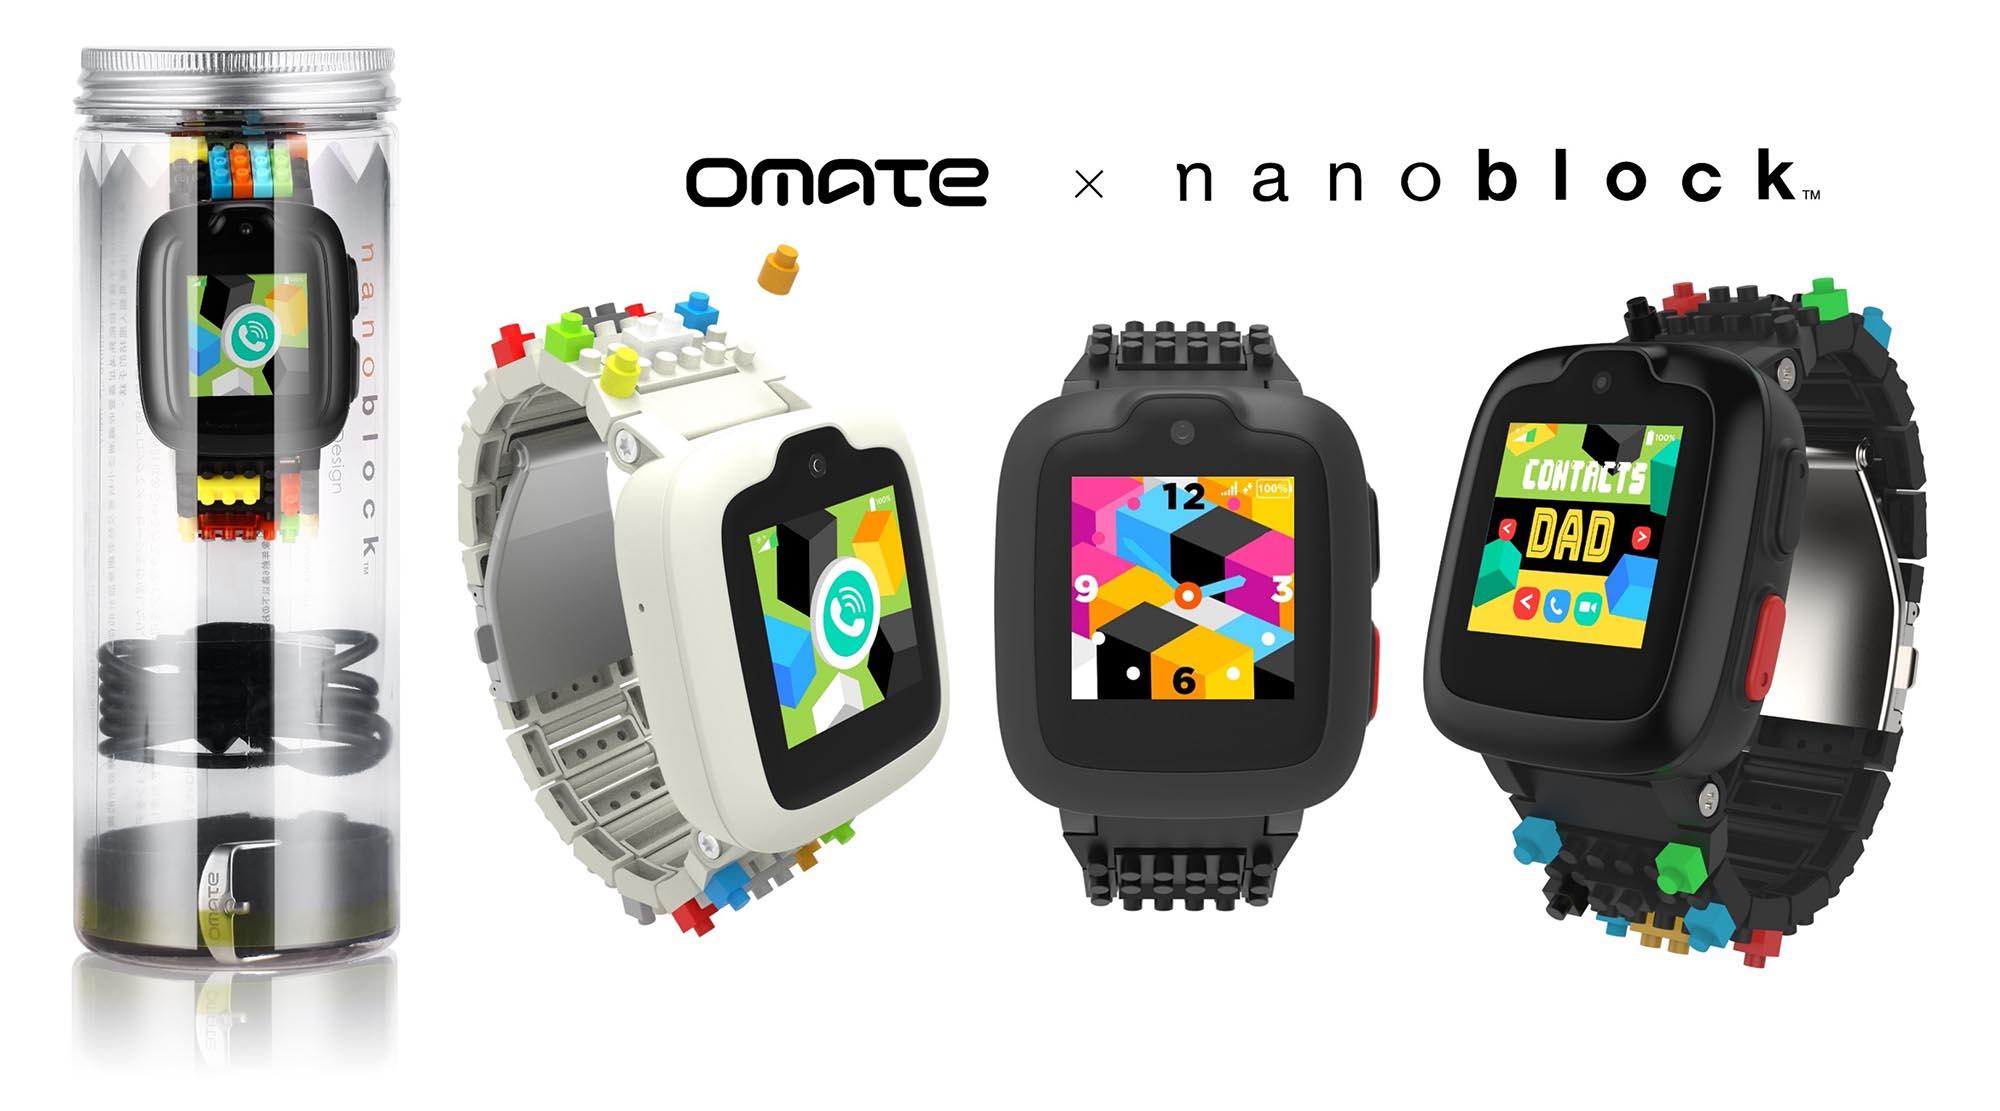 Omate x Nanoblock兒童智能手錶   走均全球都可定位通訊